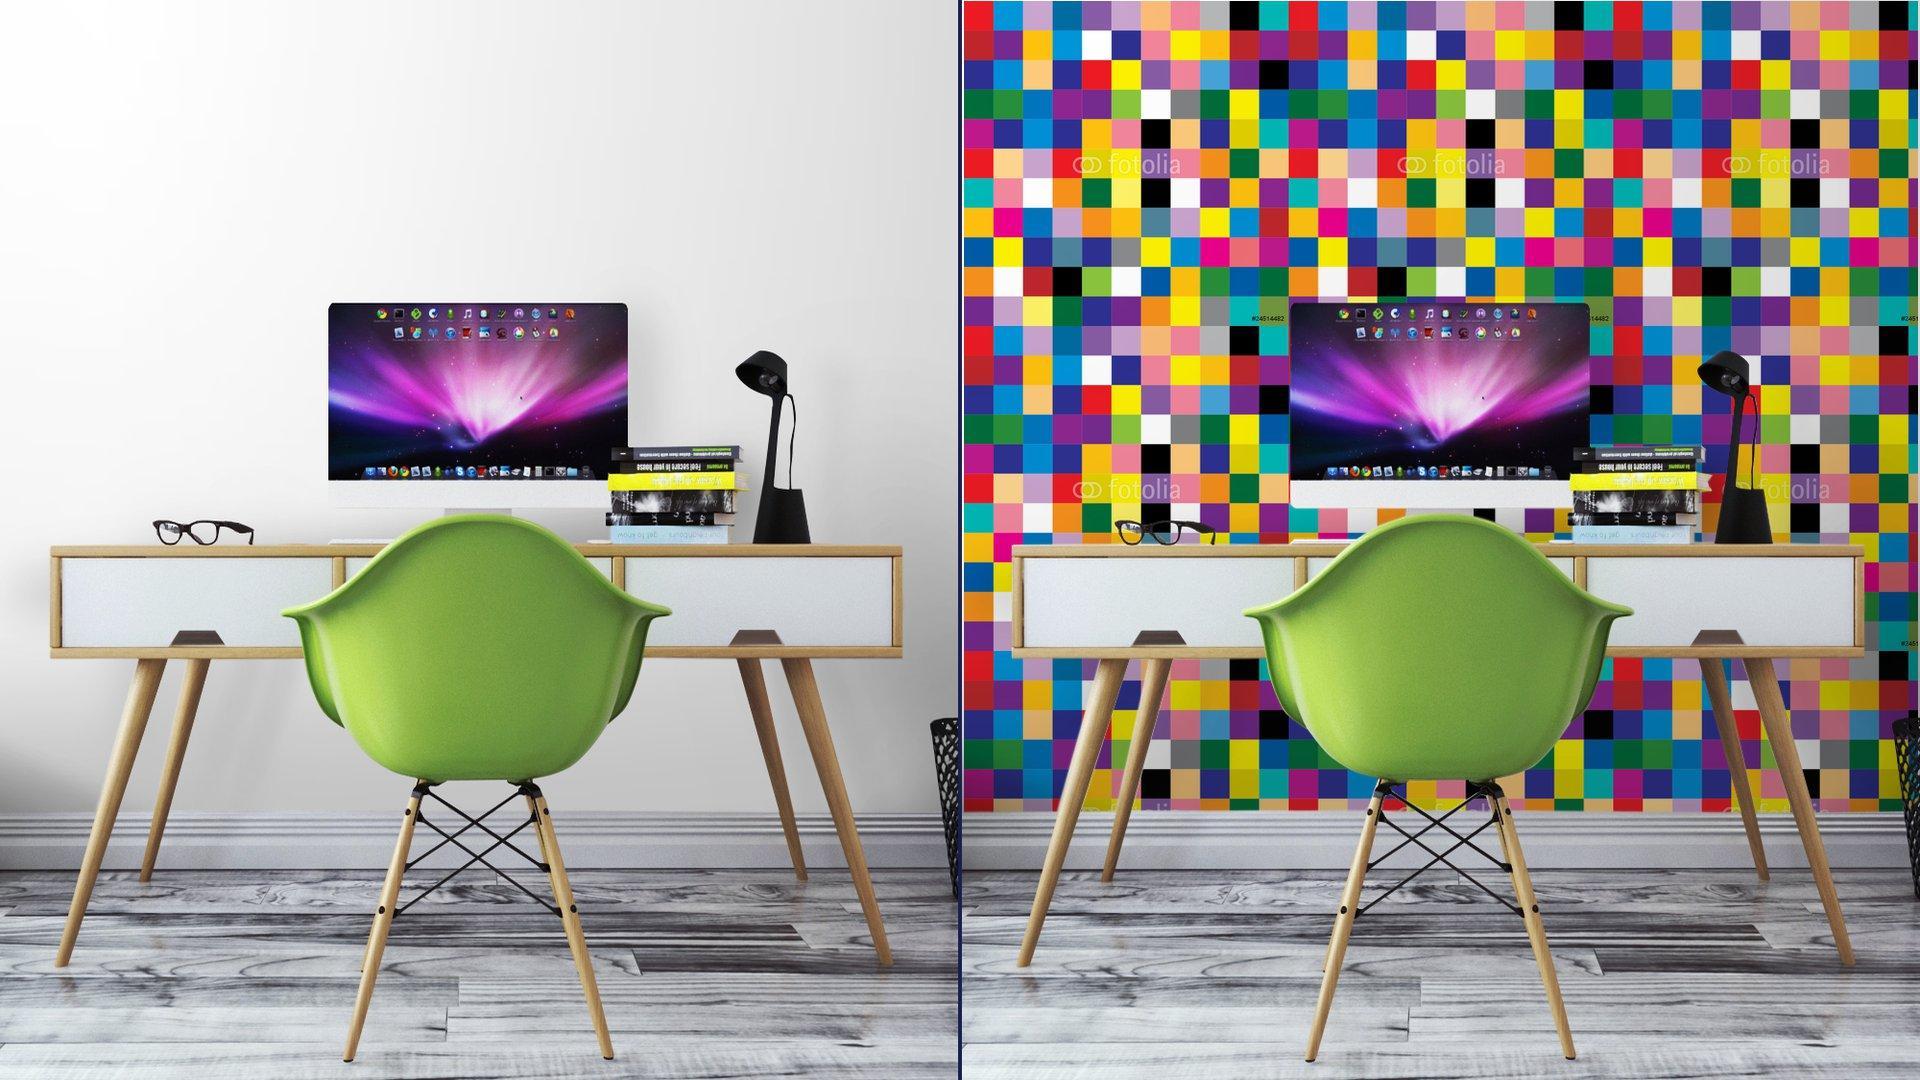 Fotomurales mexico papeles pintados abstracto cuadrado 8 - PapelTapizAbstracto Cuadros de Colores 01